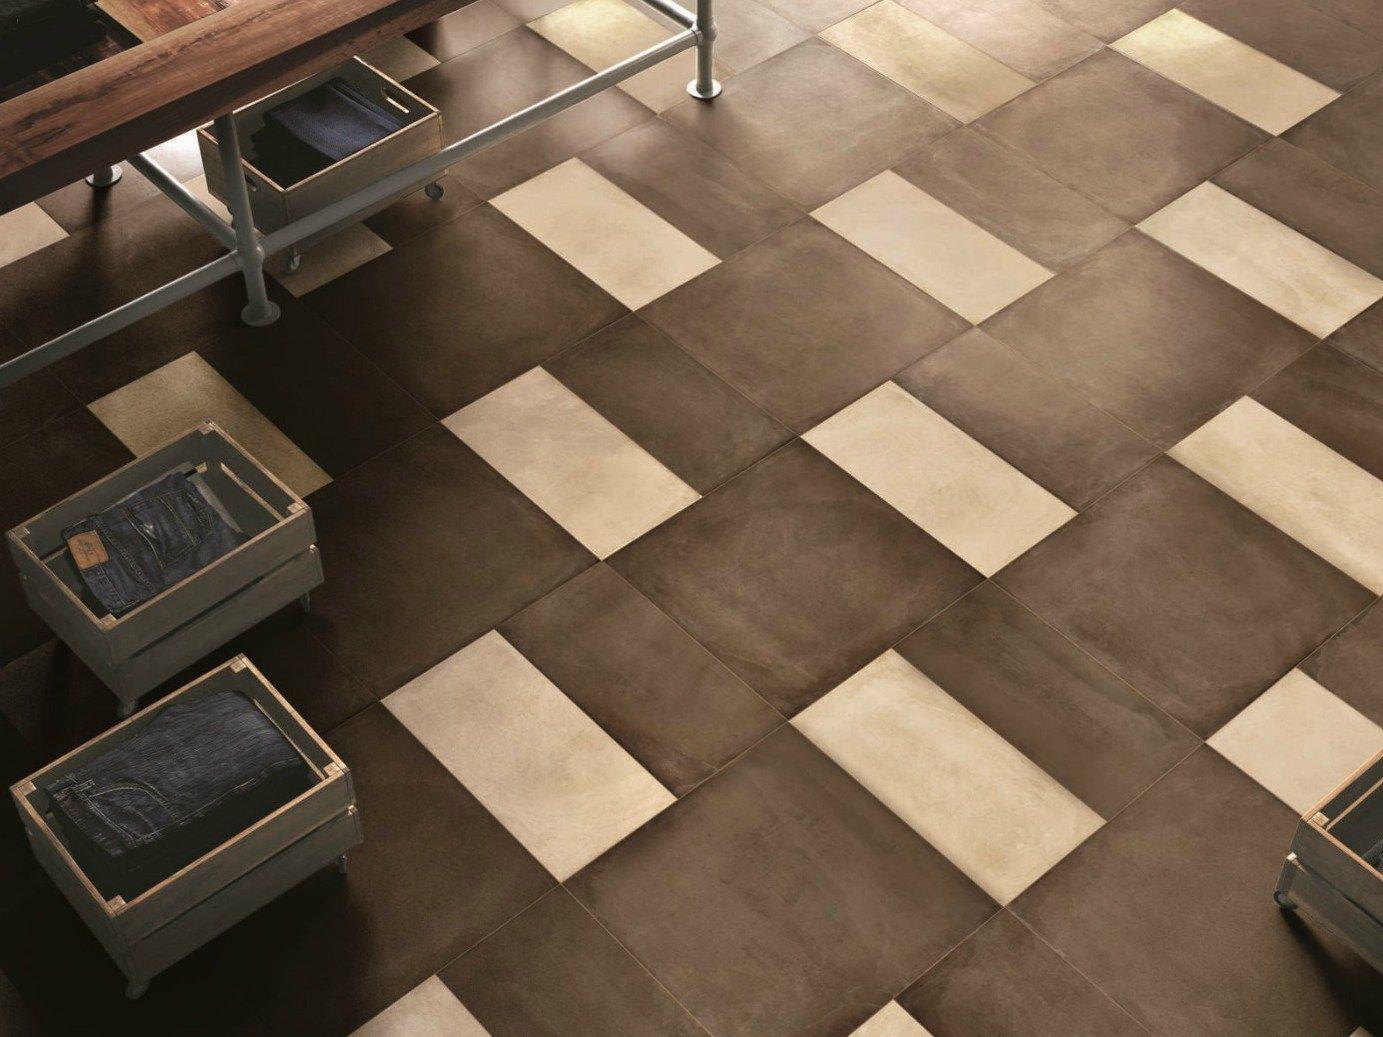 porcelain stoneware wall floor tiles with concrete effect. Black Bedroom Furniture Sets. Home Design Ideas